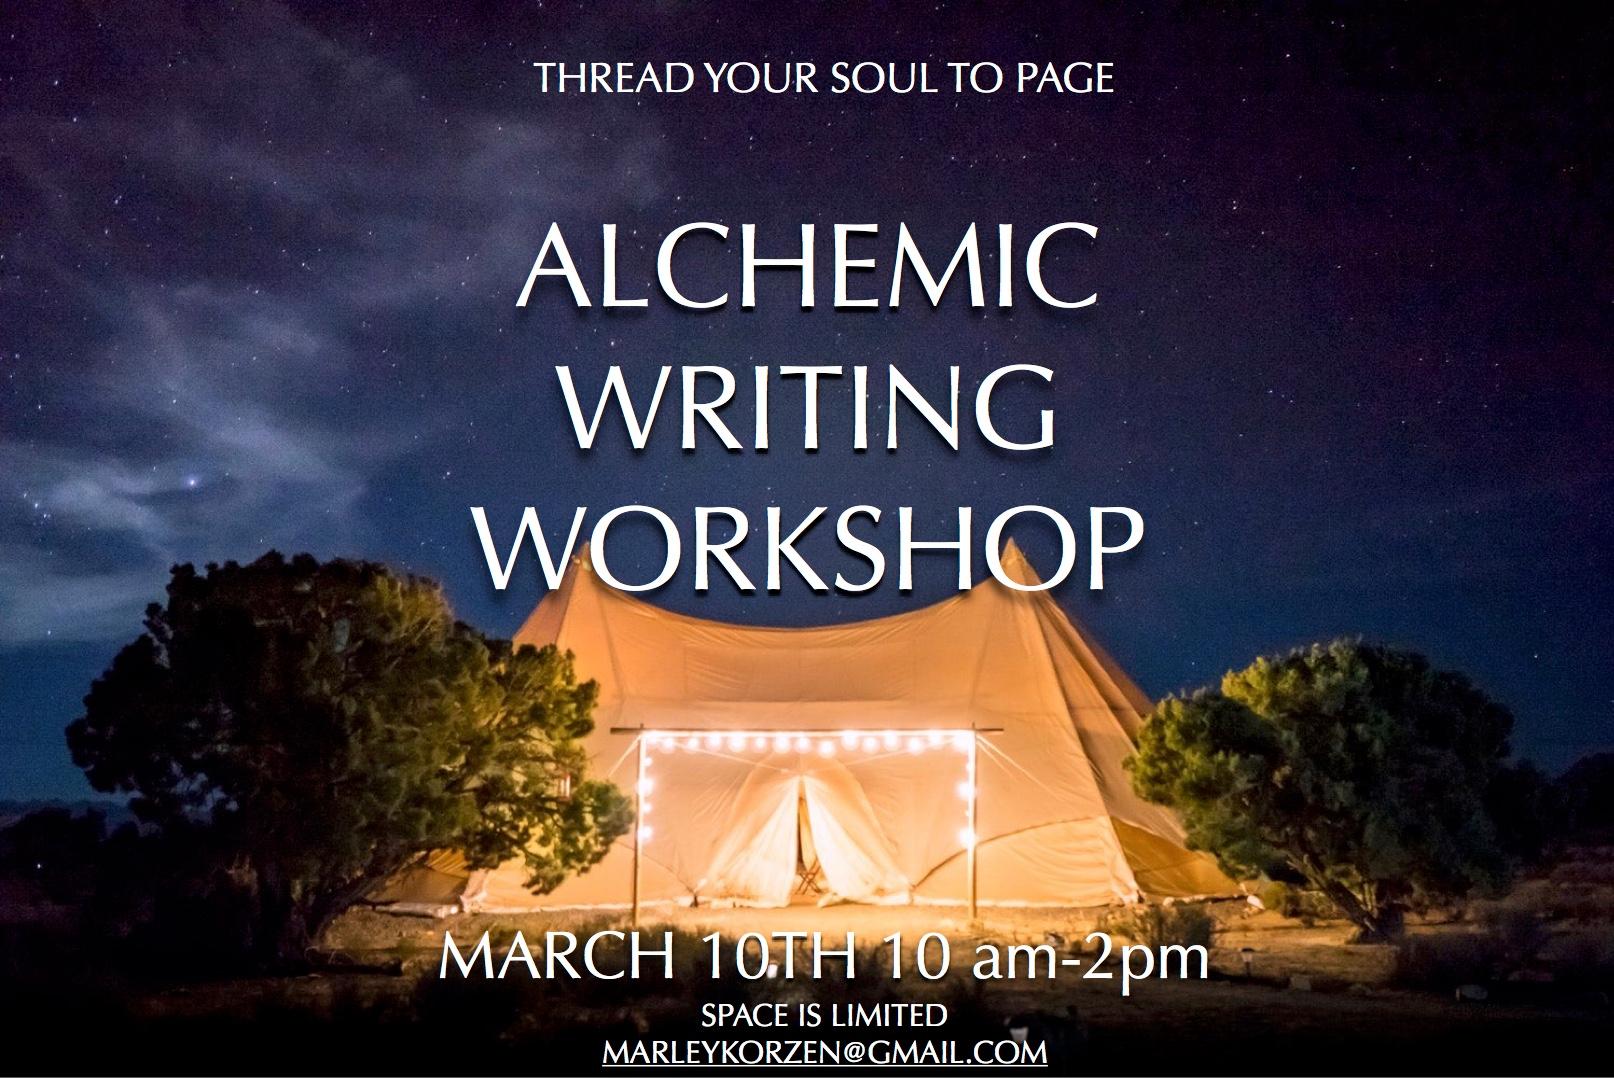 Alchemic Writing Workshop